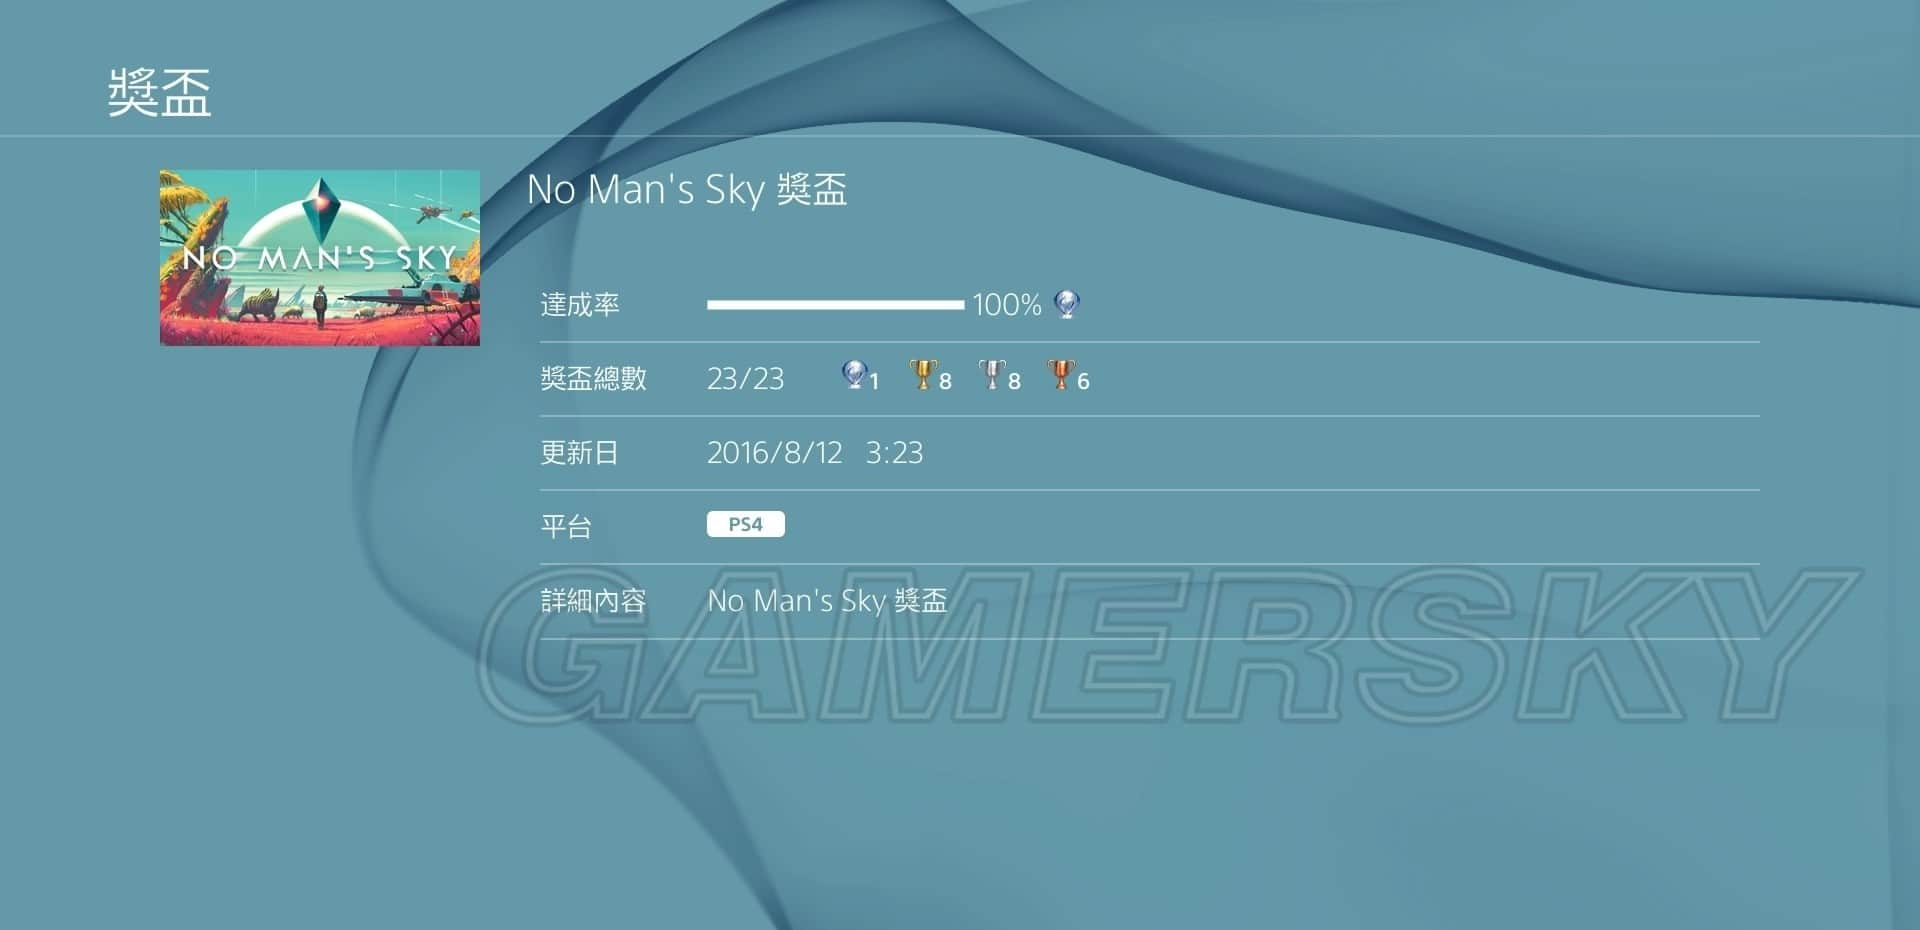 No Man's Sky 白金攻略 全獎盃達成白金攻略